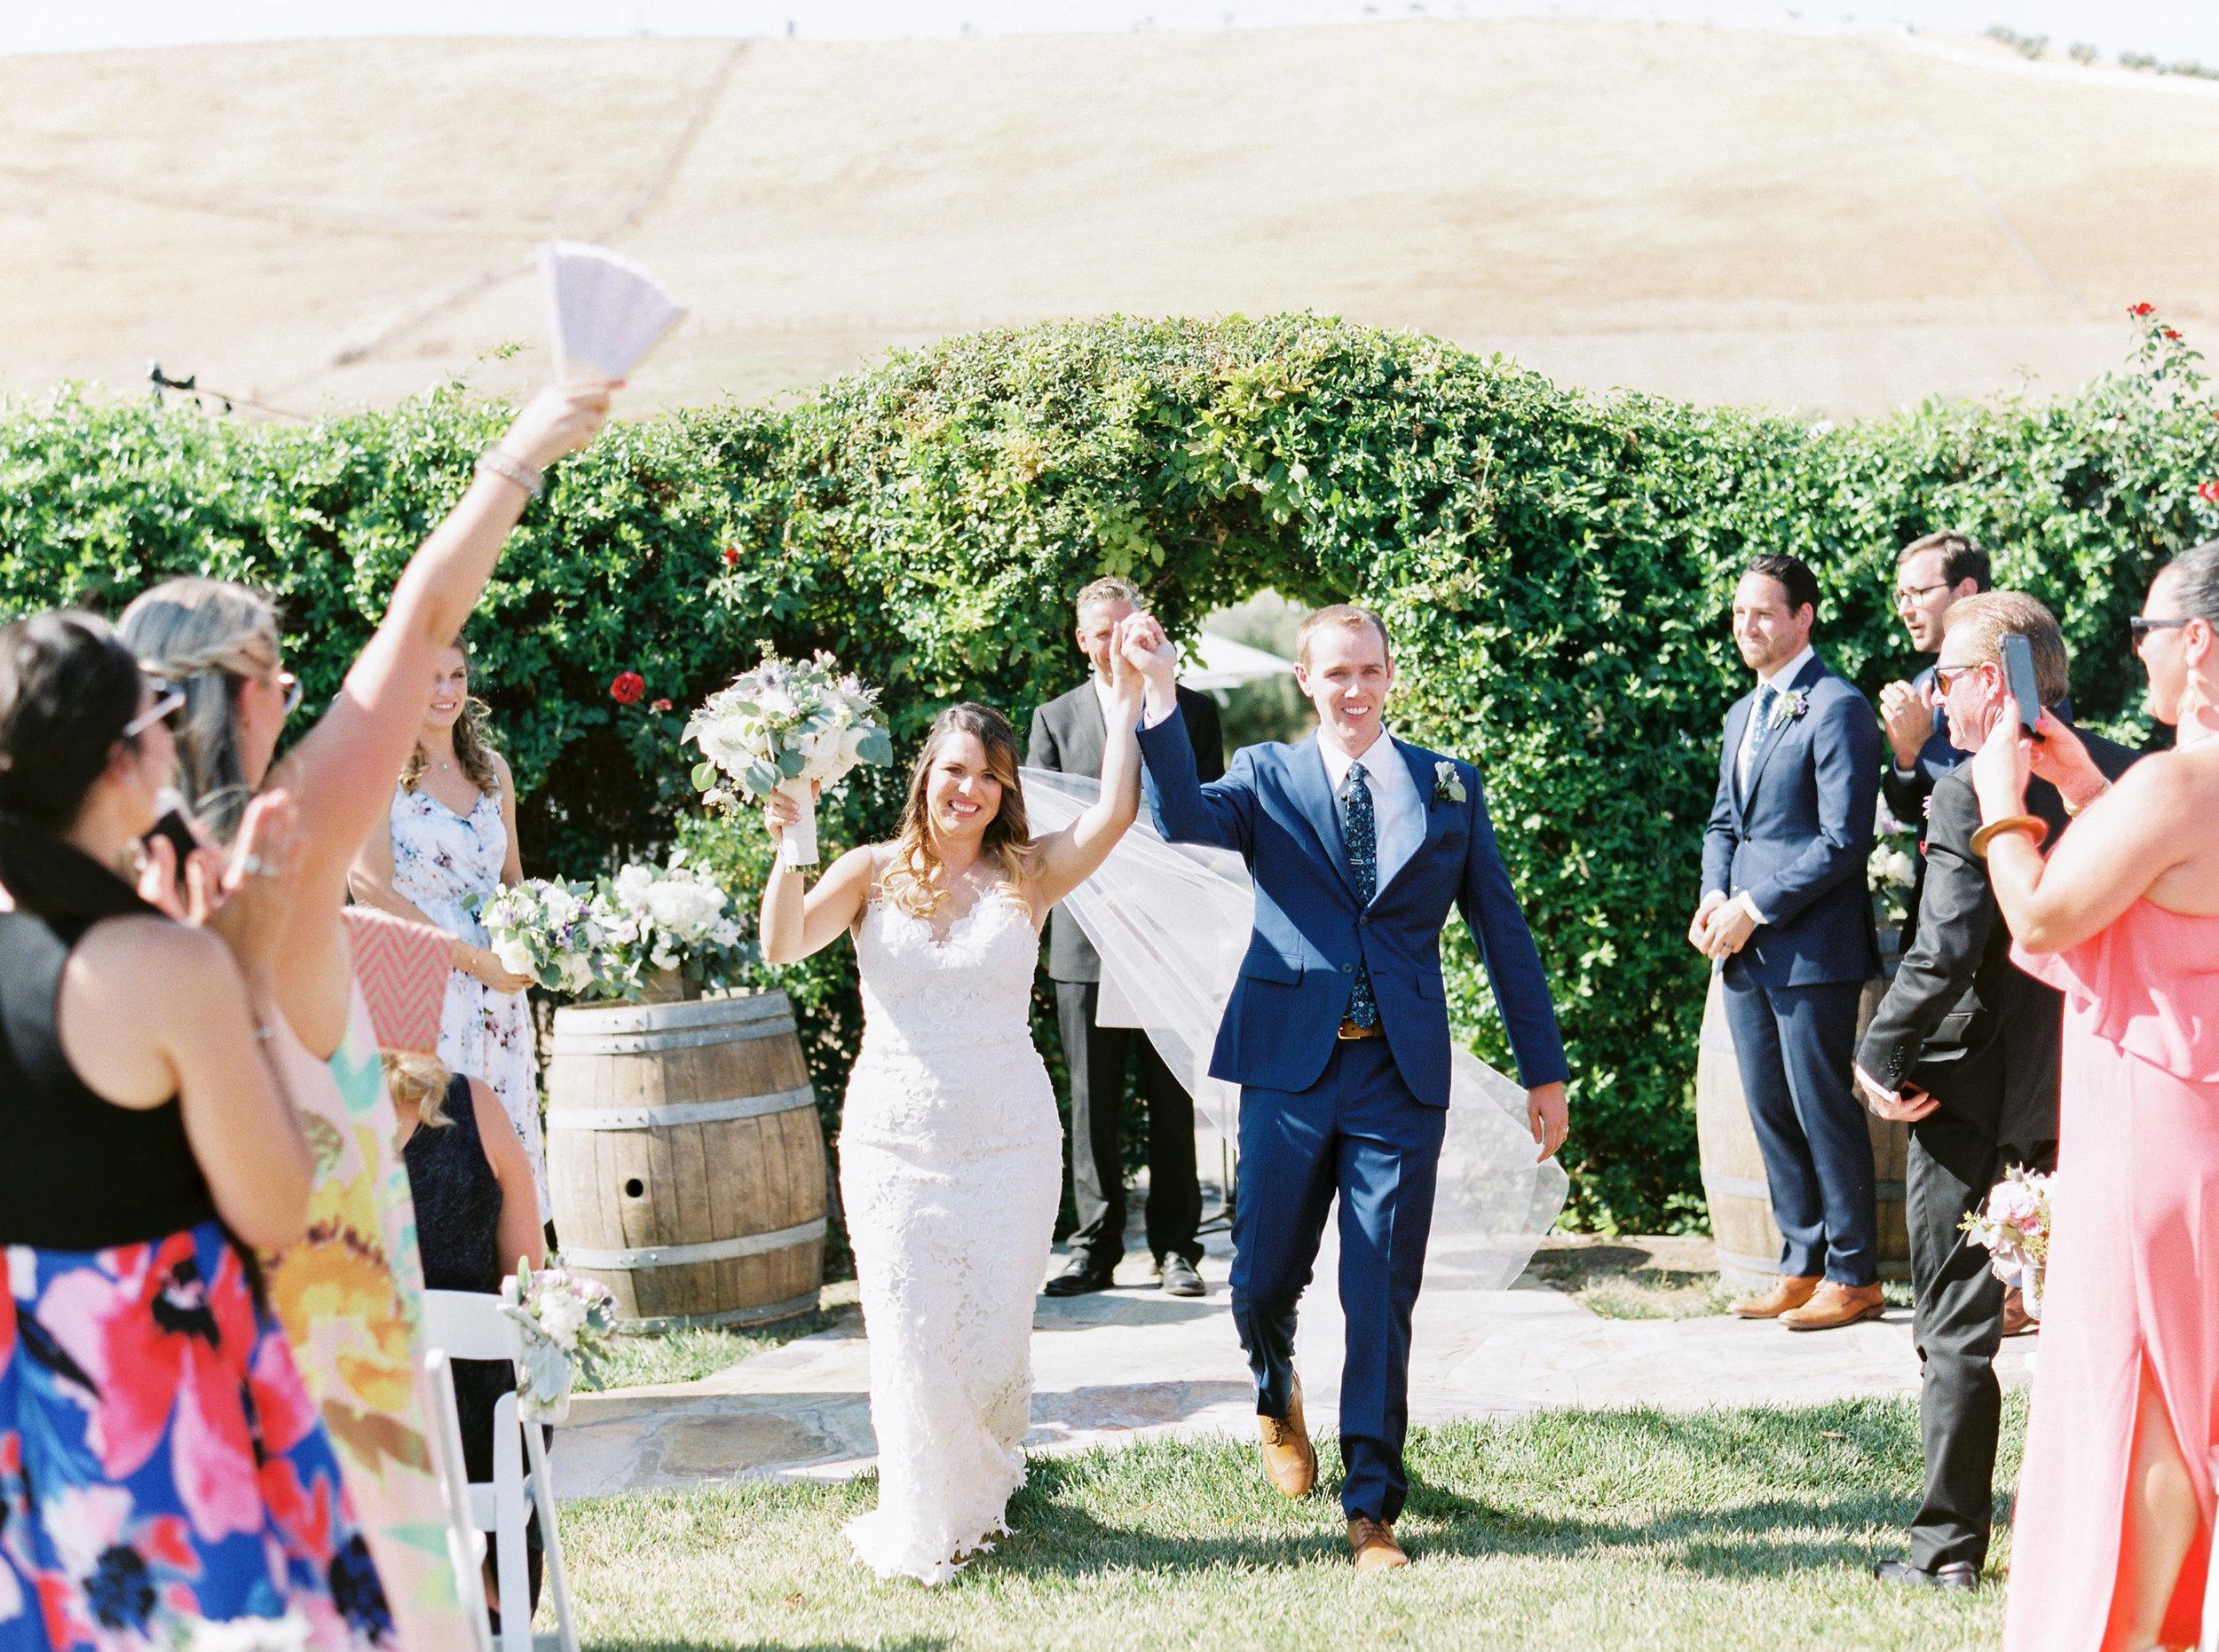 the-purple-orchid-resort-wedding-in-livermore-california-166.jpg